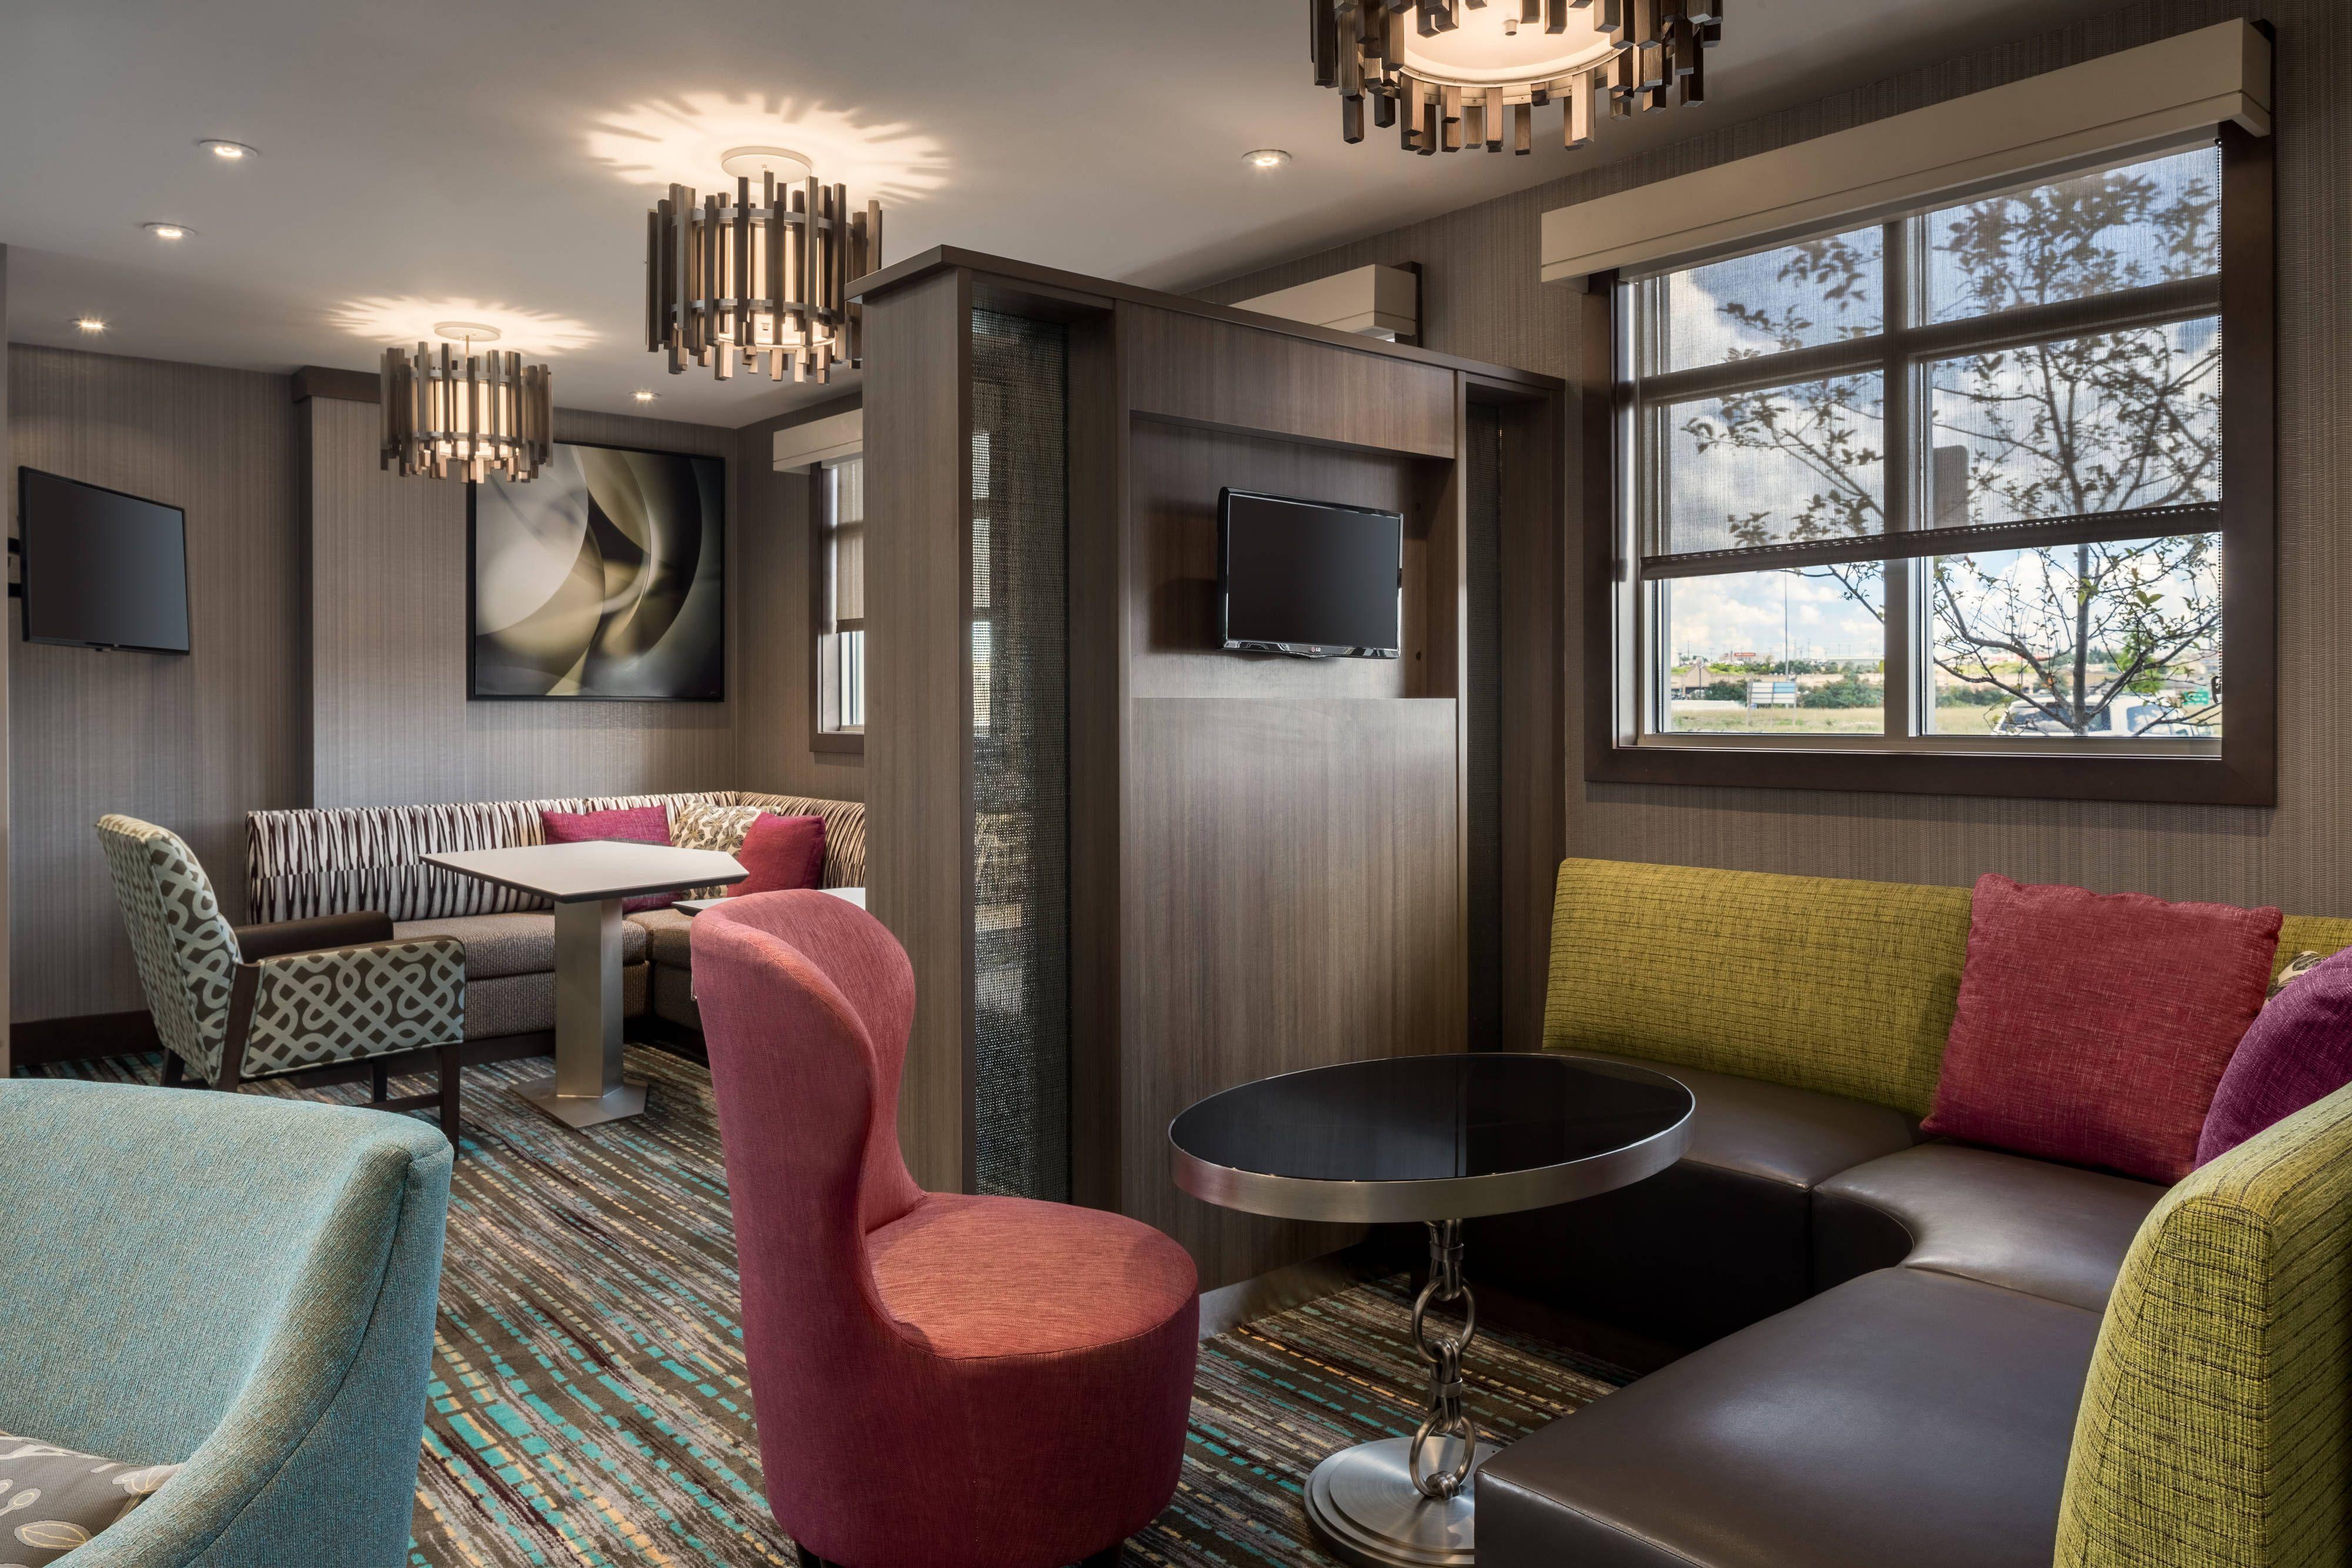 Residence Inn WheelingSt. Clairsville, OH Lobby Suite,